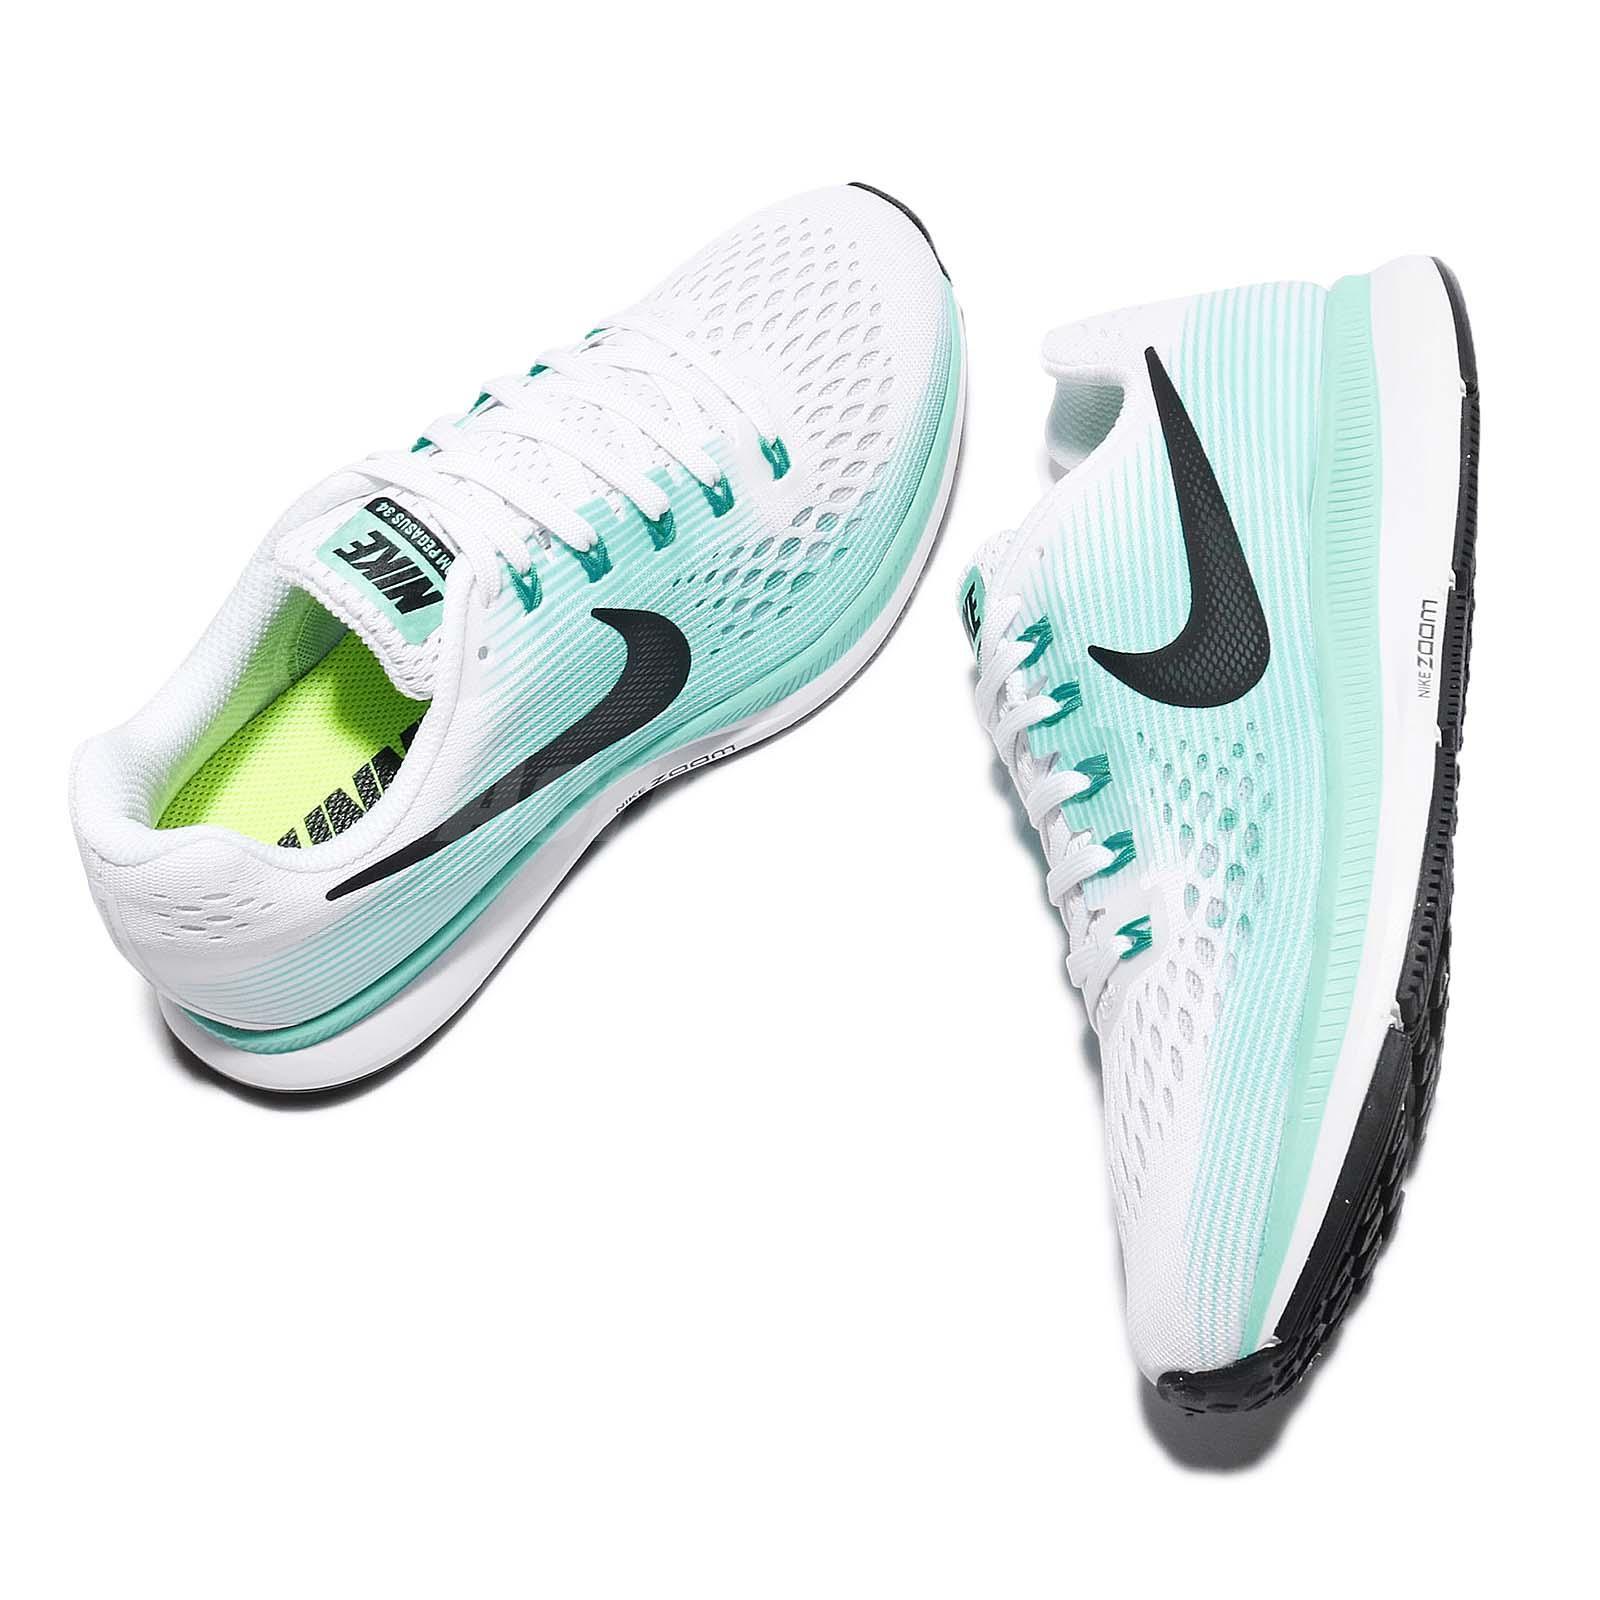 Nike Zoom Air Pegasus 34 Mujeres Verde Aurora EmIiDNCt